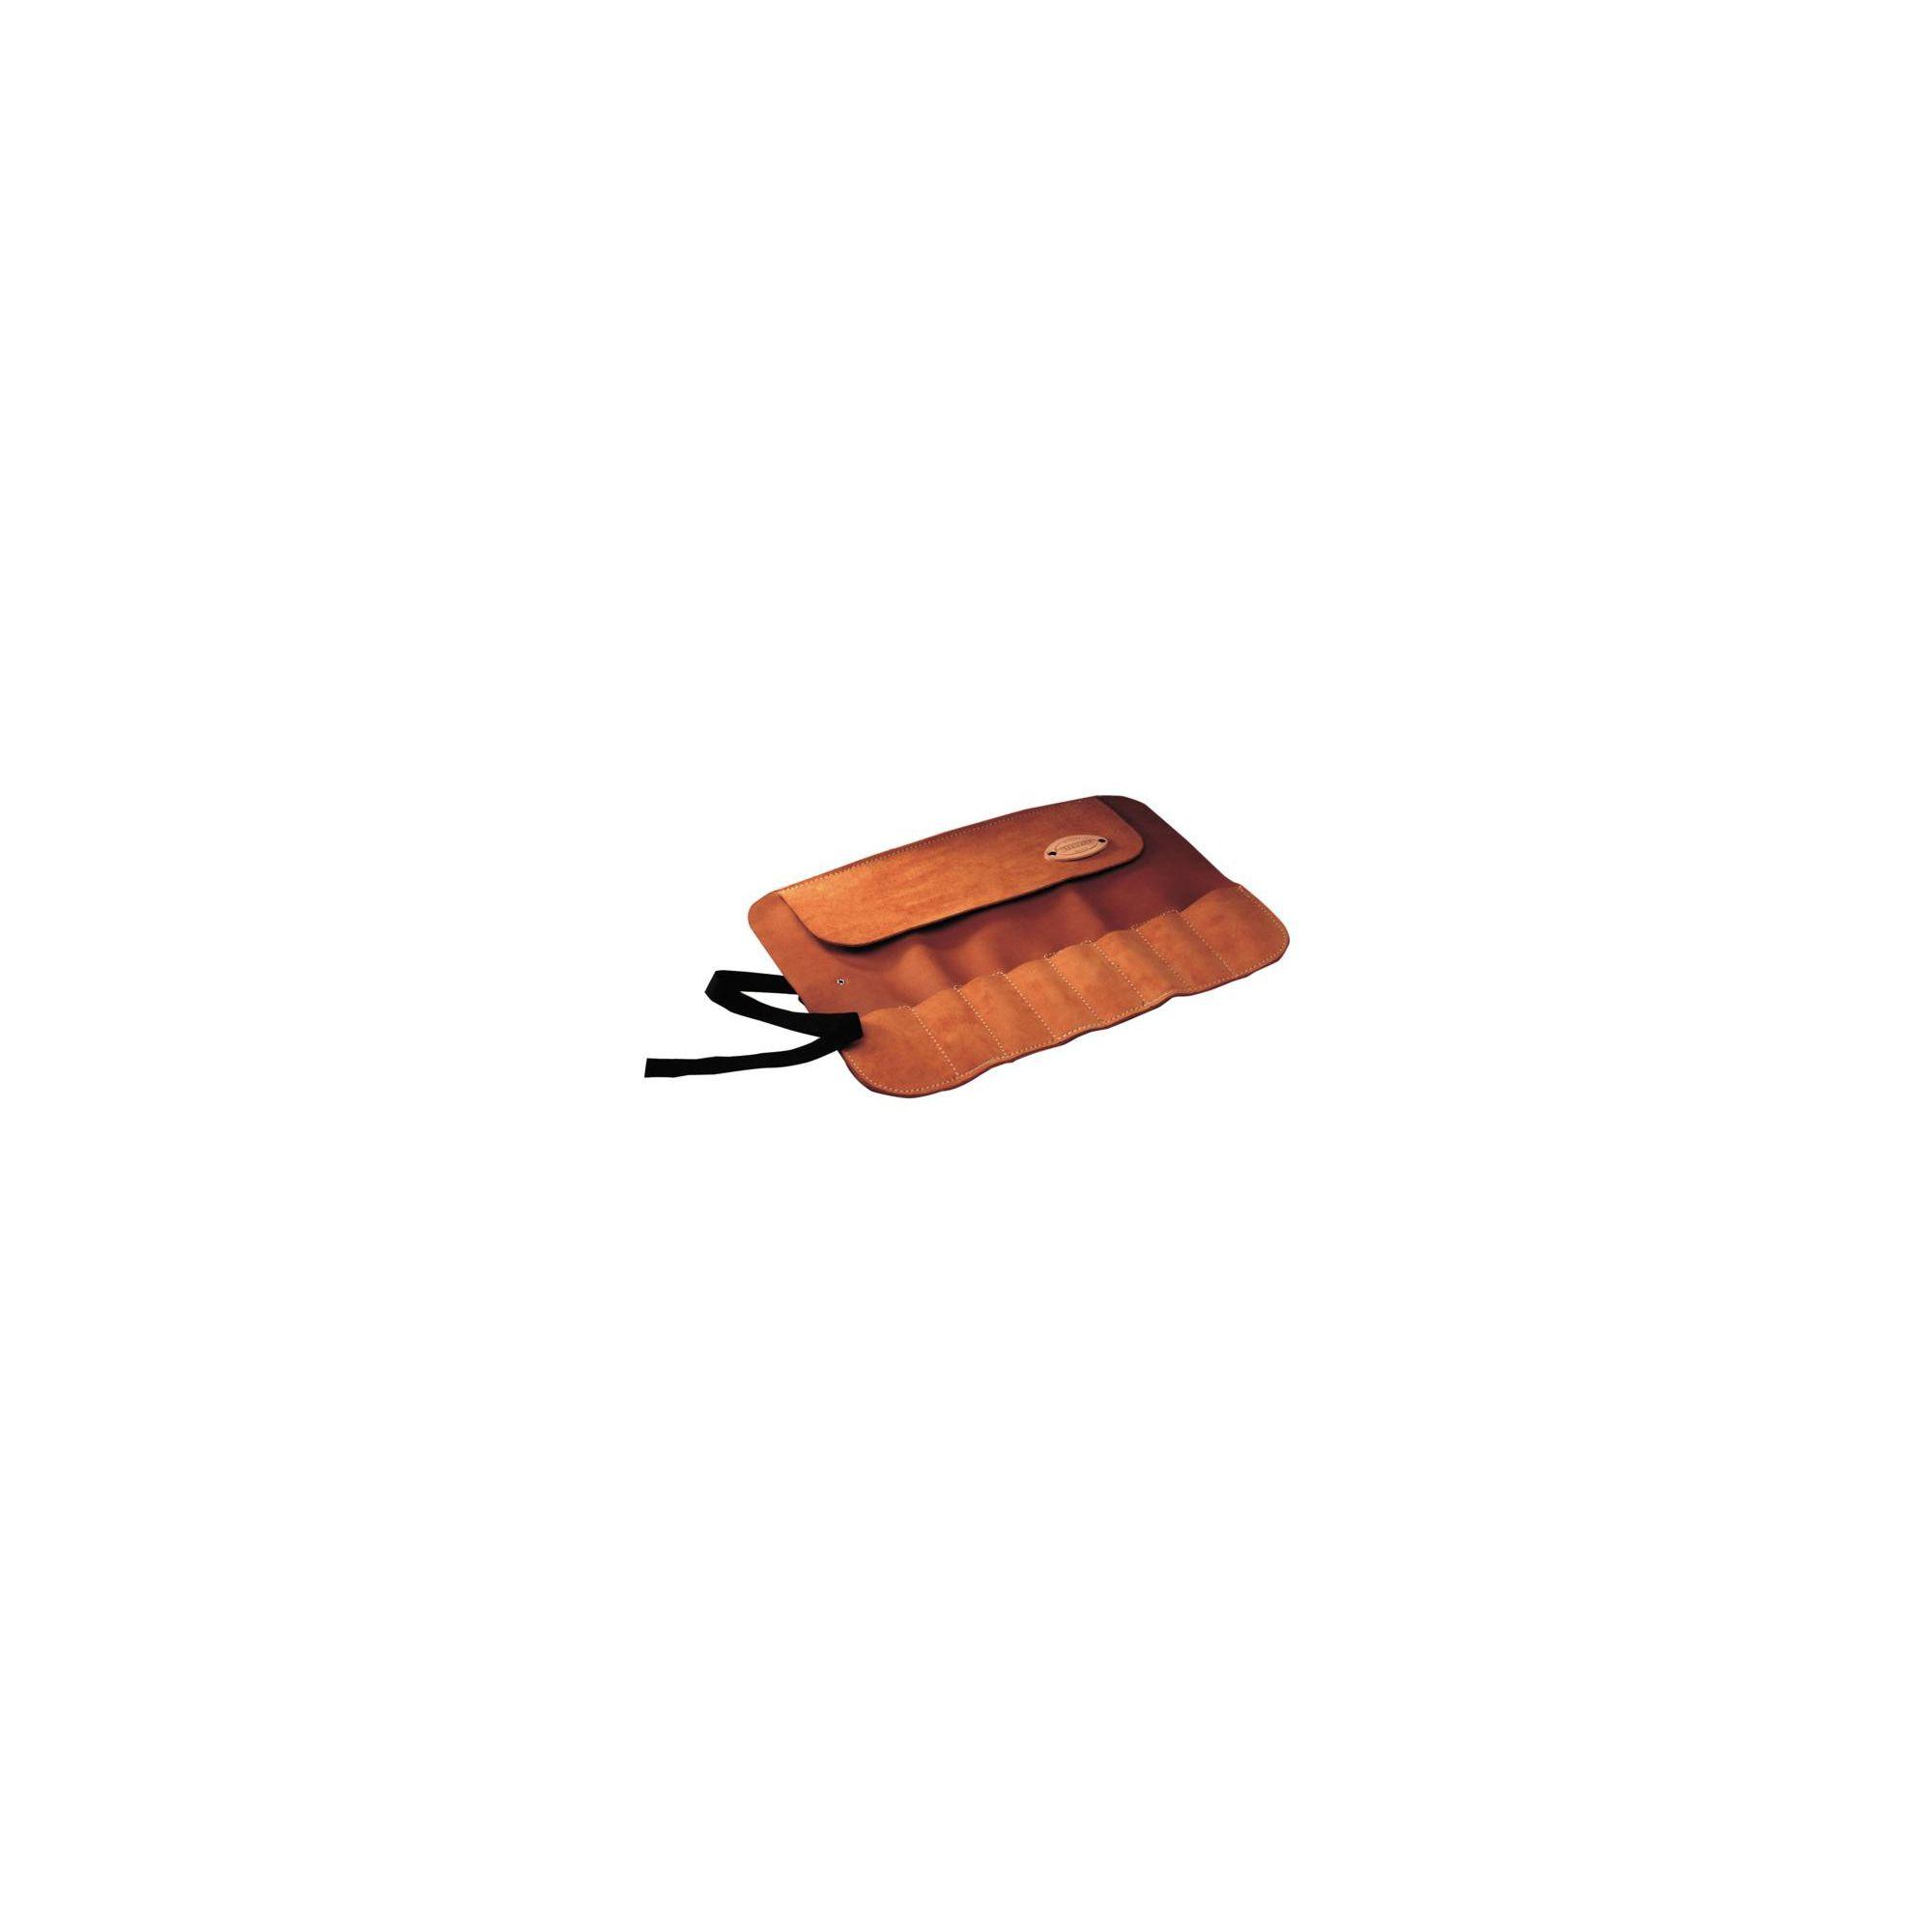 Faithfull Tools 8 Pocket Leather Chisel Roll Storage